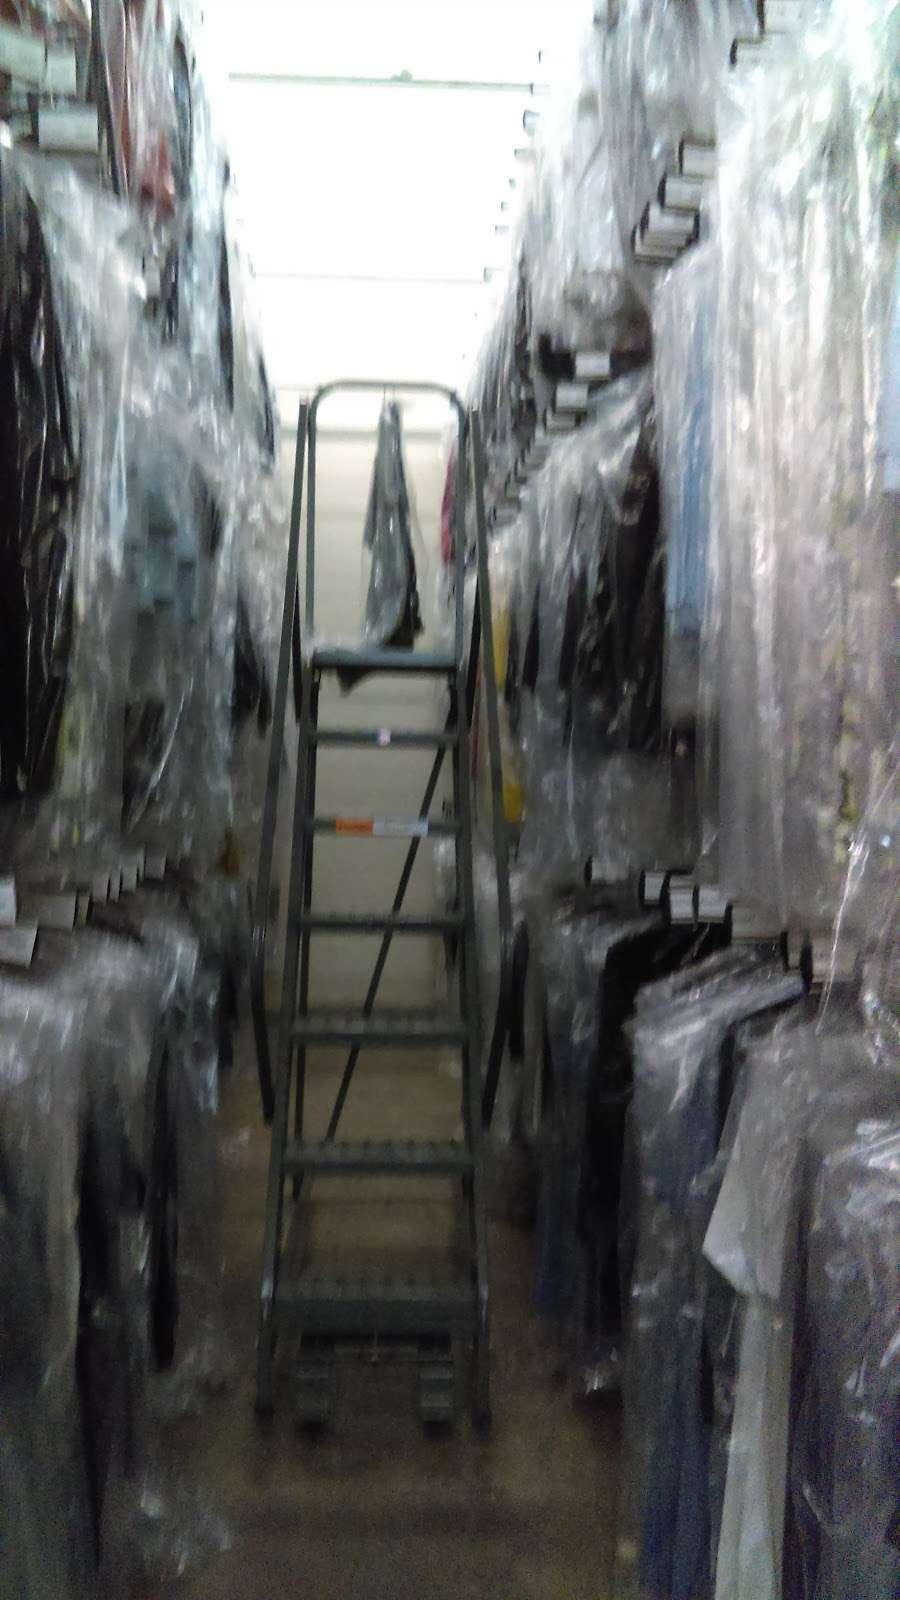 Port Logistics Group - storage    Photo 5 of 6   Address: 125 Castle Rd, Secaucus, NJ 07094, USA   Phone: (201) 865-2121